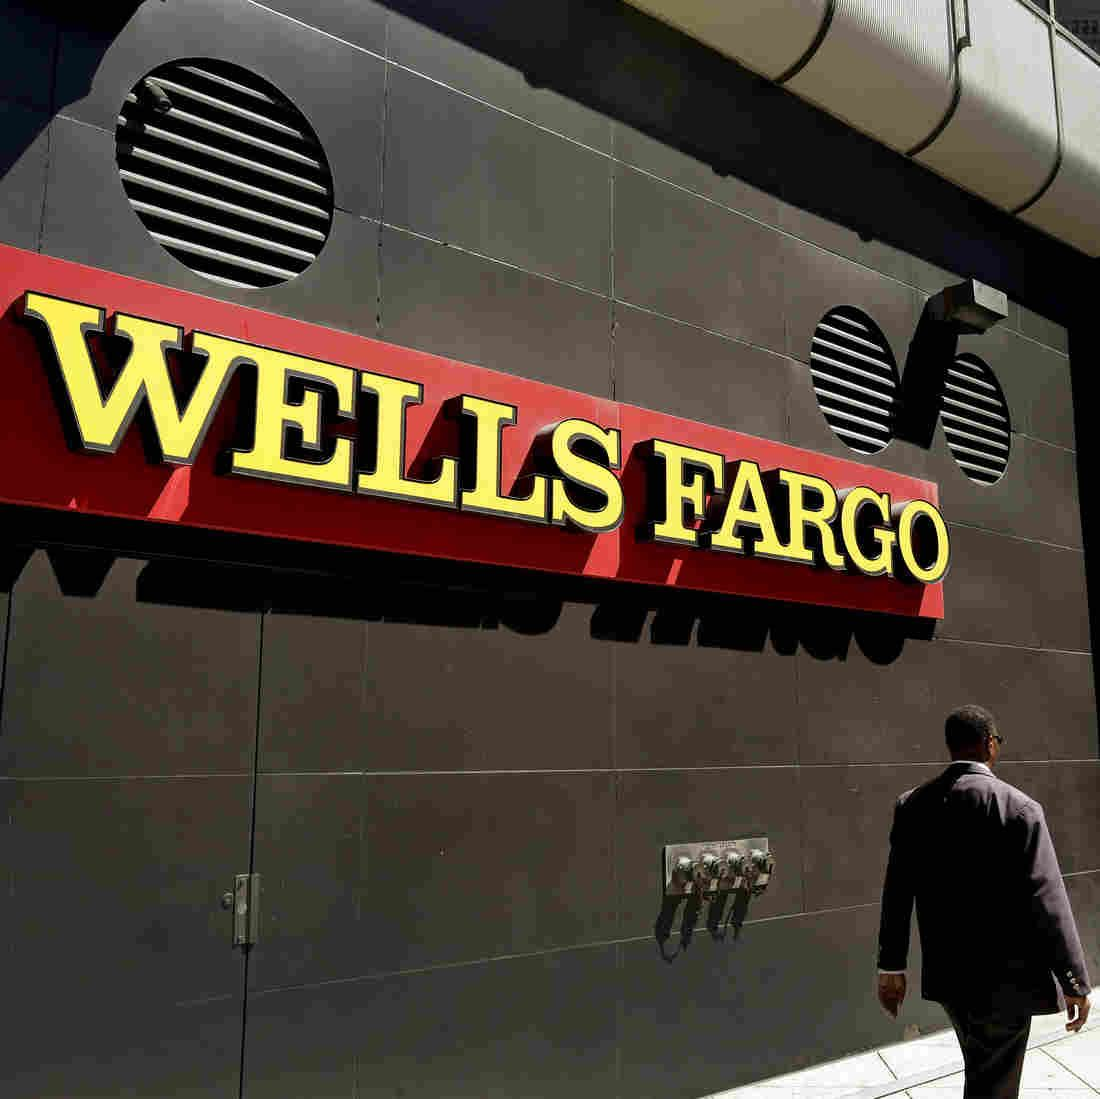 Exwells fargo employees sue allege they were punished